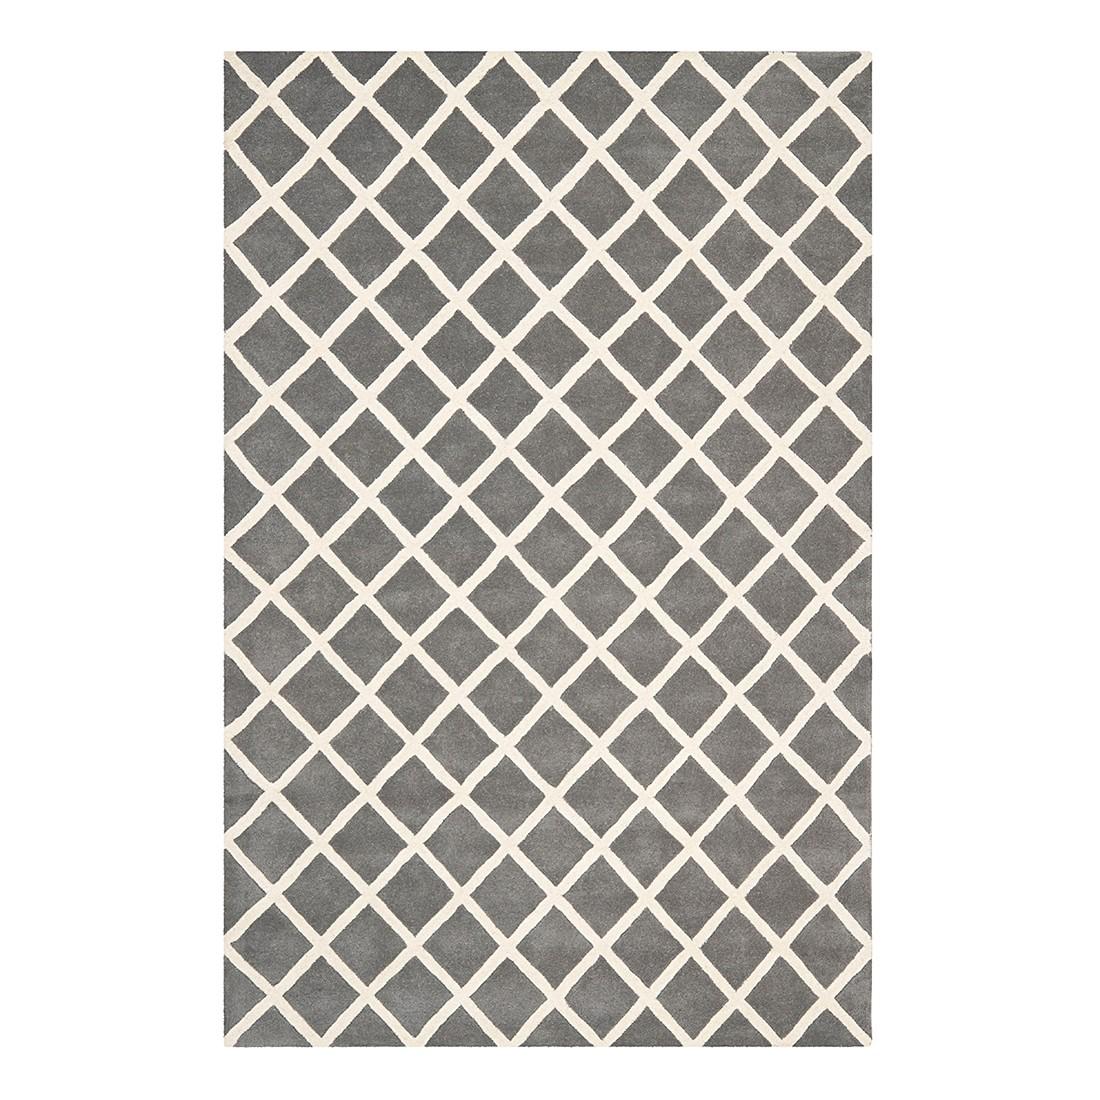 teppich soho grau creme safavieh online kaufen. Black Bedroom Furniture Sets. Home Design Ideas